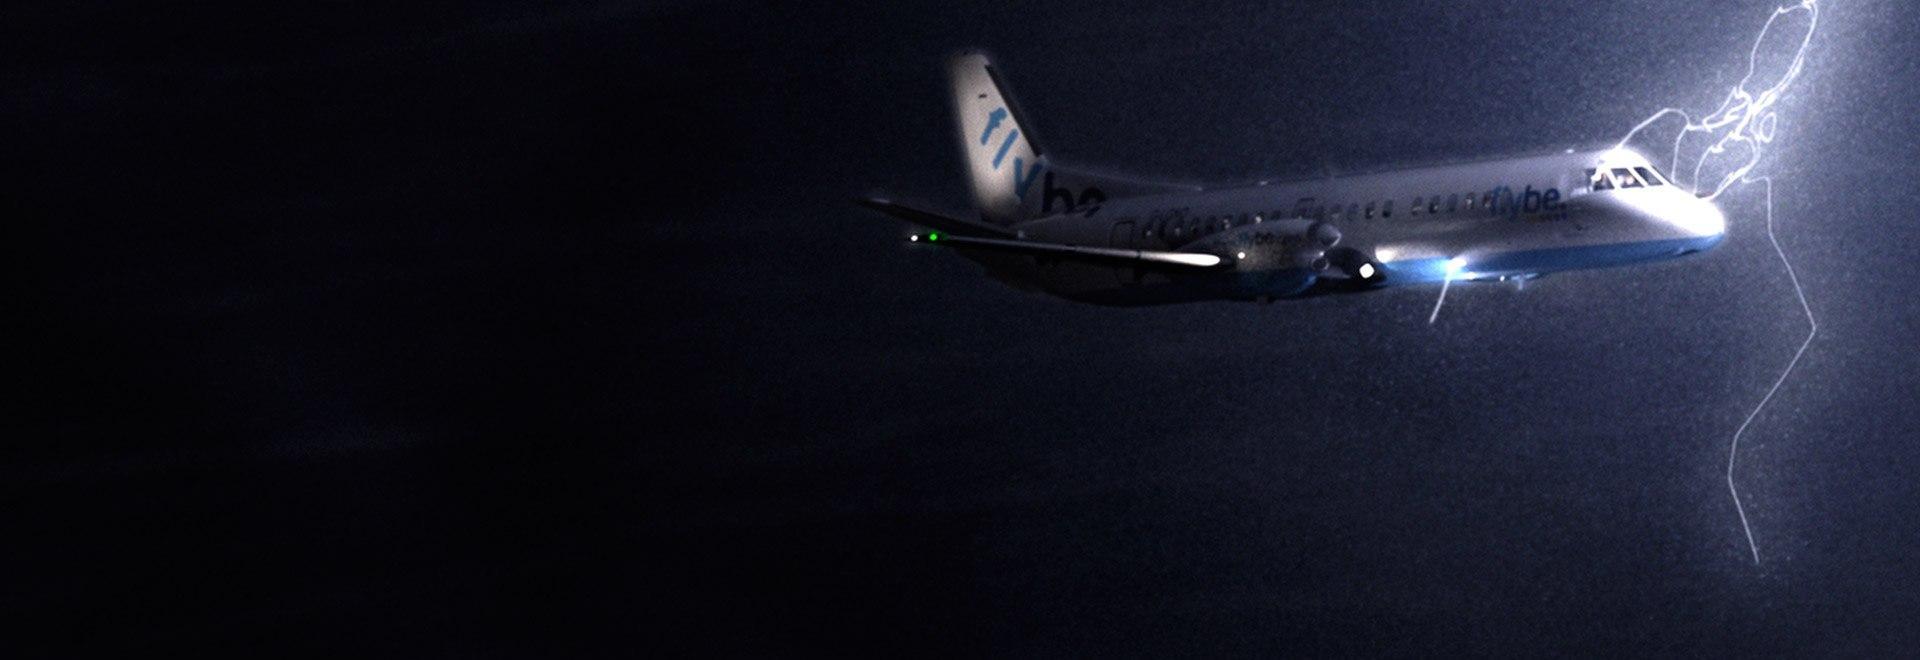 Missione letale